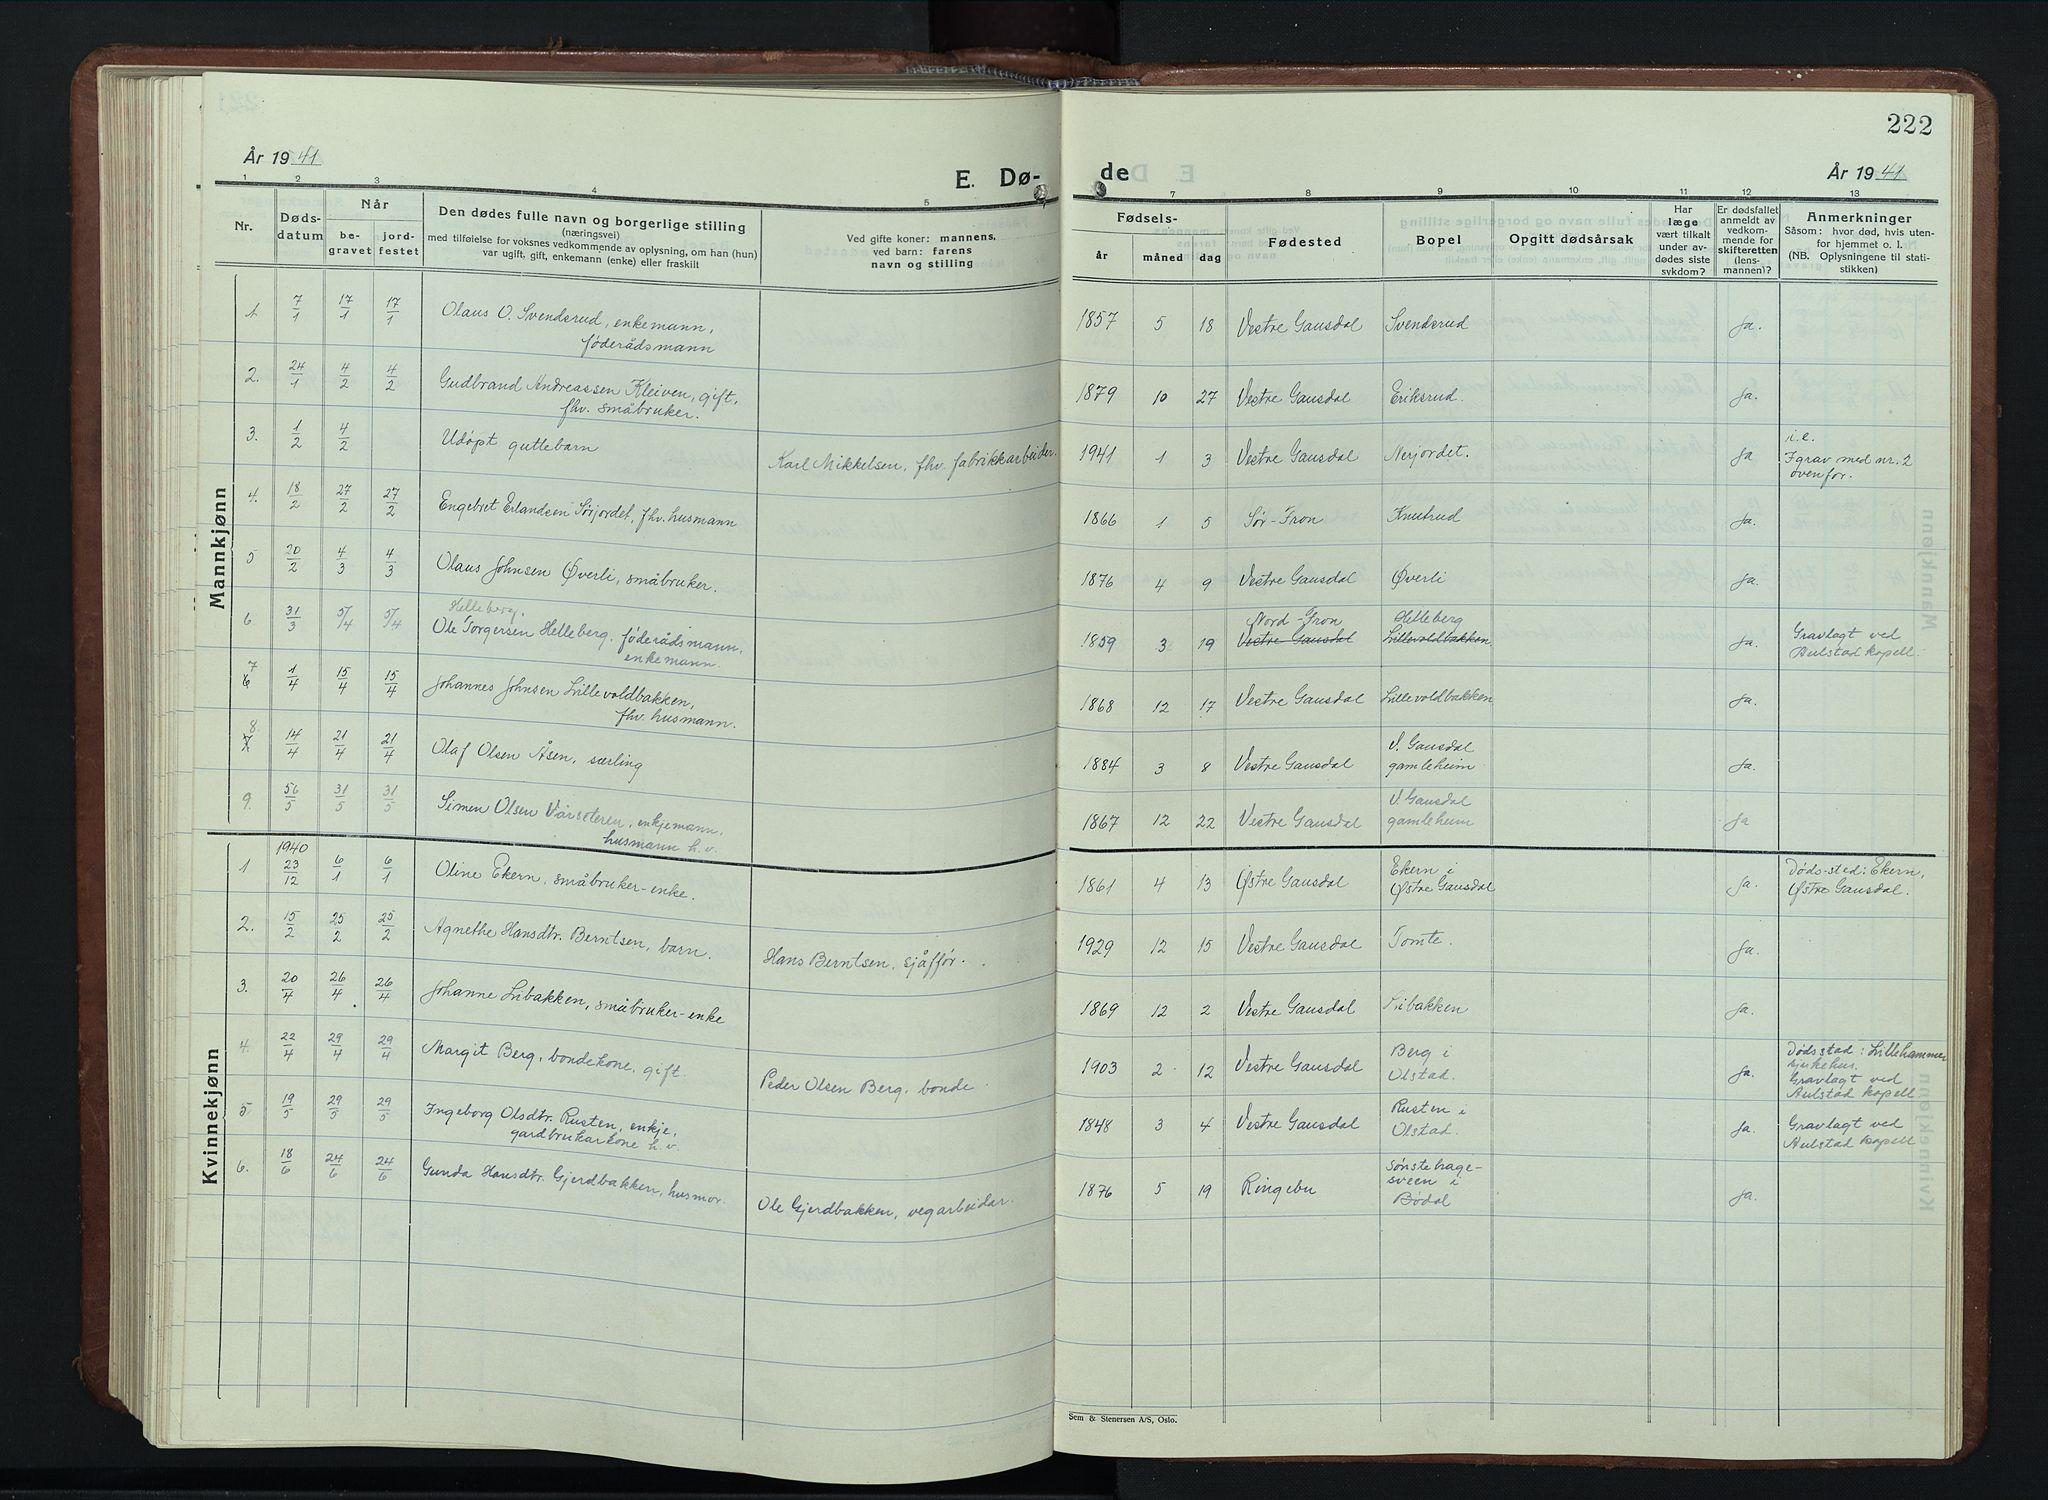 SAH, Vestre Gausdal prestekontor, Klokkerbok nr. 5, 1926-1955, s. 222